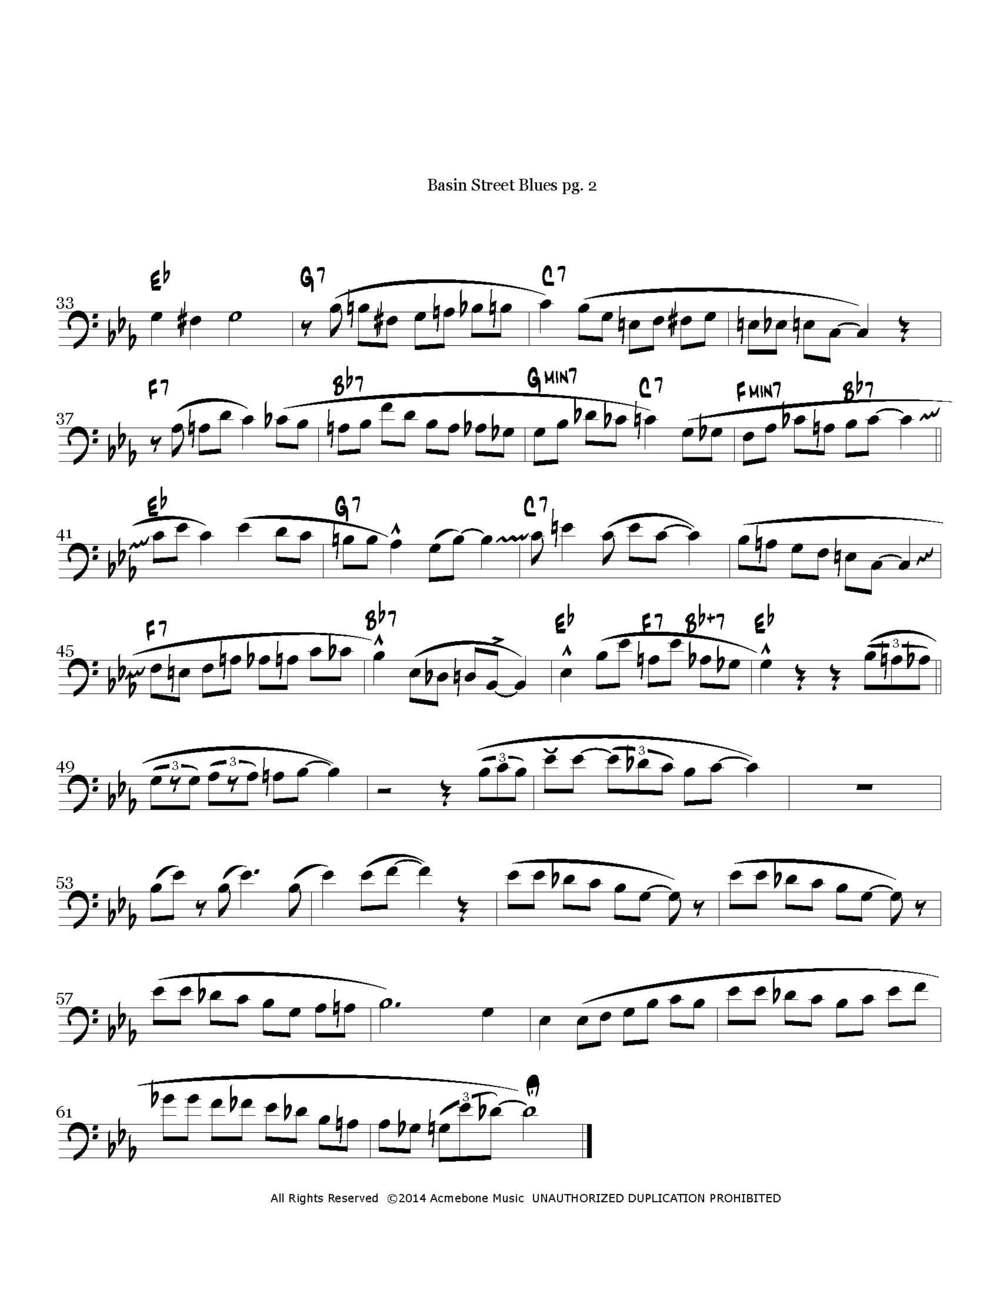 Basin Street Blues_download_from_acmebone.com_Page_3.jpg